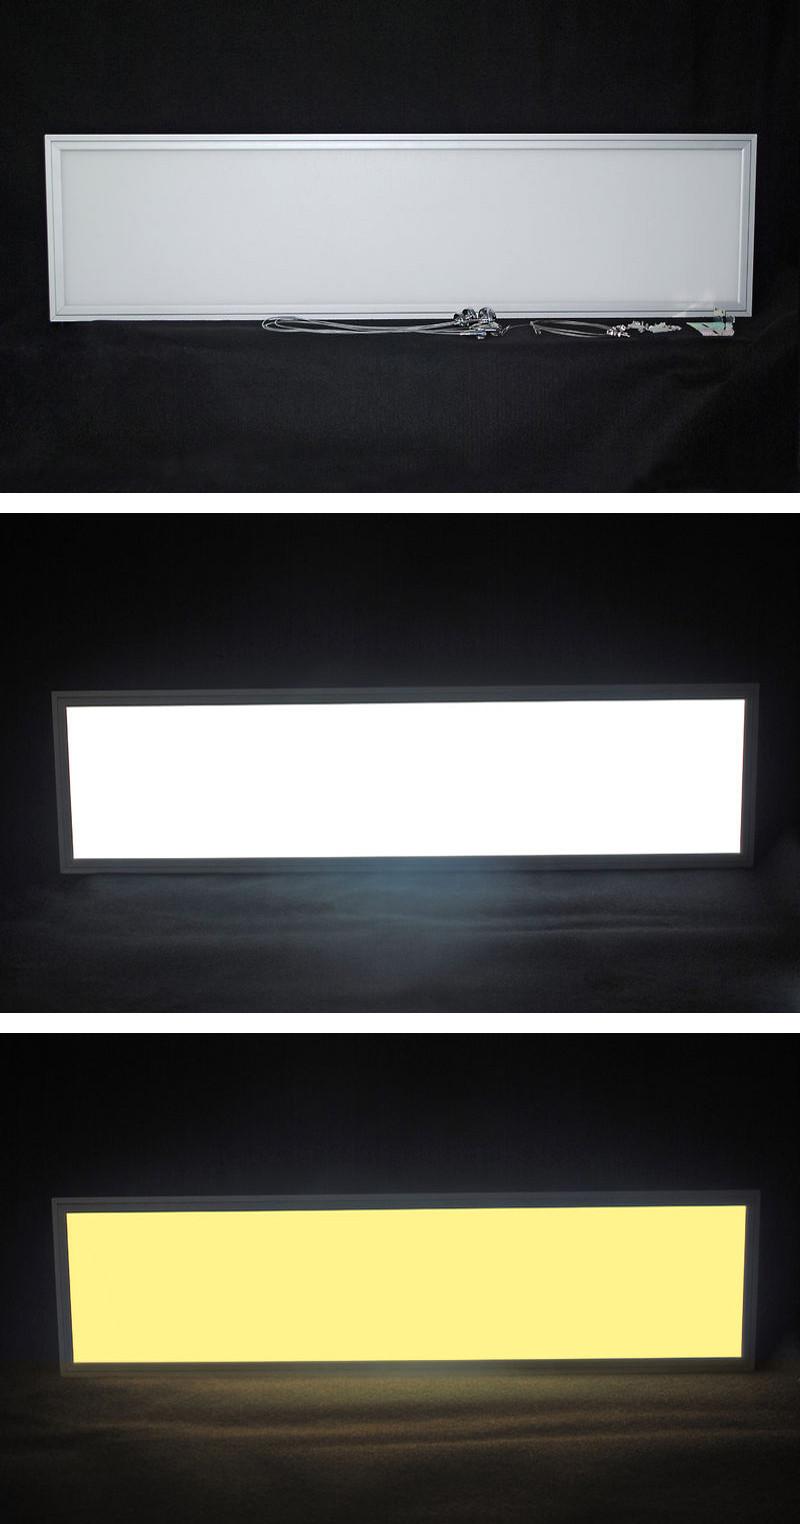 40w ul troffer cleanroom fixture panel light 1x4 led panel down 40w ul troffer cleanroom fixture panel light 1x4 led panel down light 30x120 60x60 arubaitofo Gallery